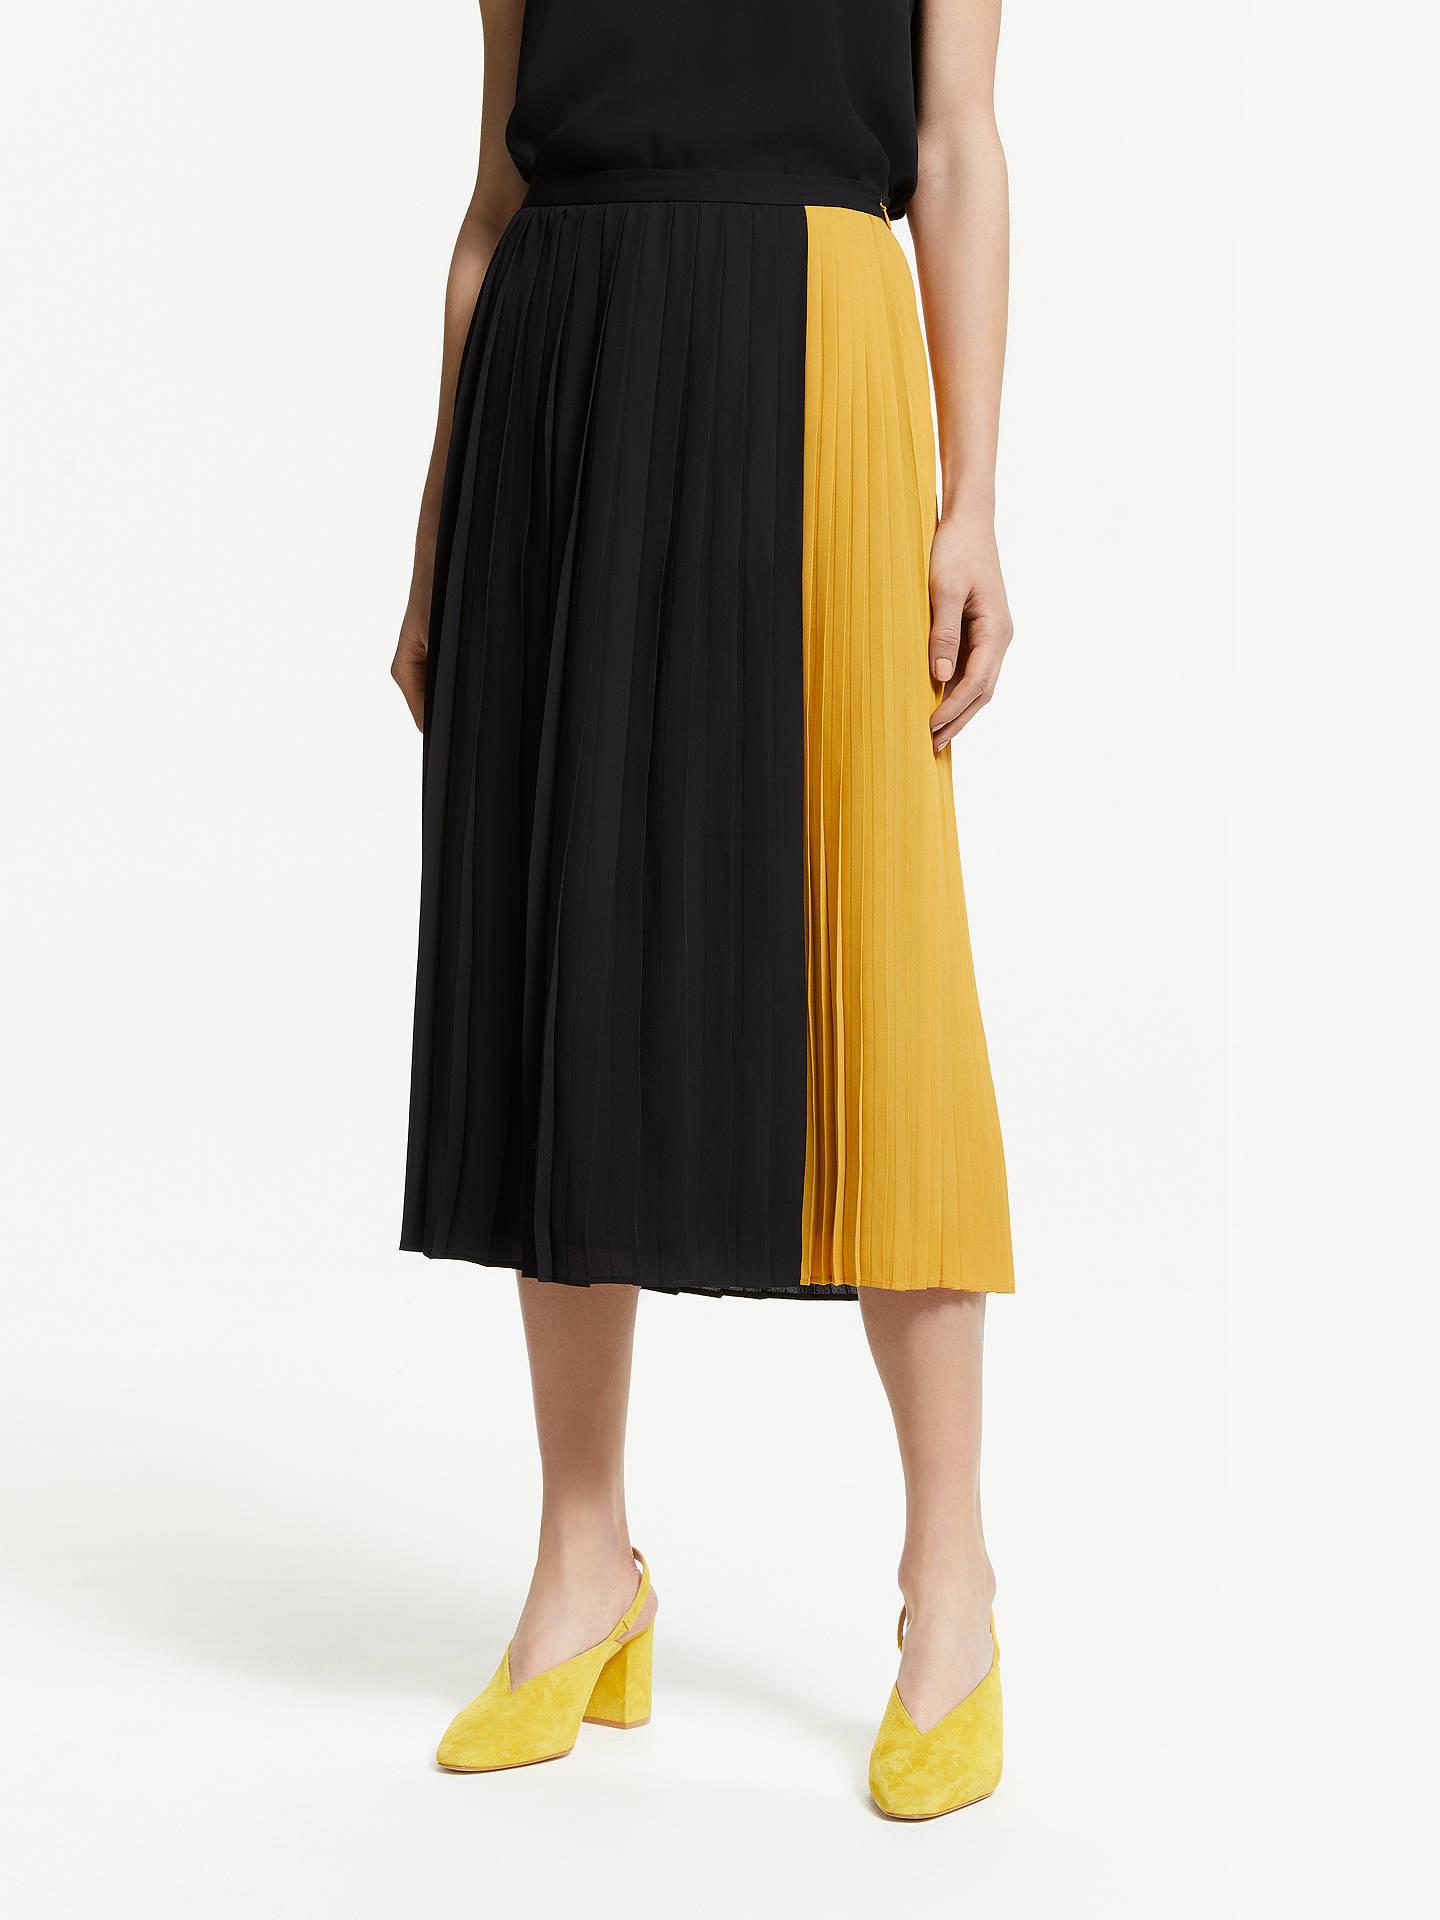 398ab2985e Buy John Lewis & Partners Colour Block Pleat Skirt, Black/Mustard, 10  Online ...